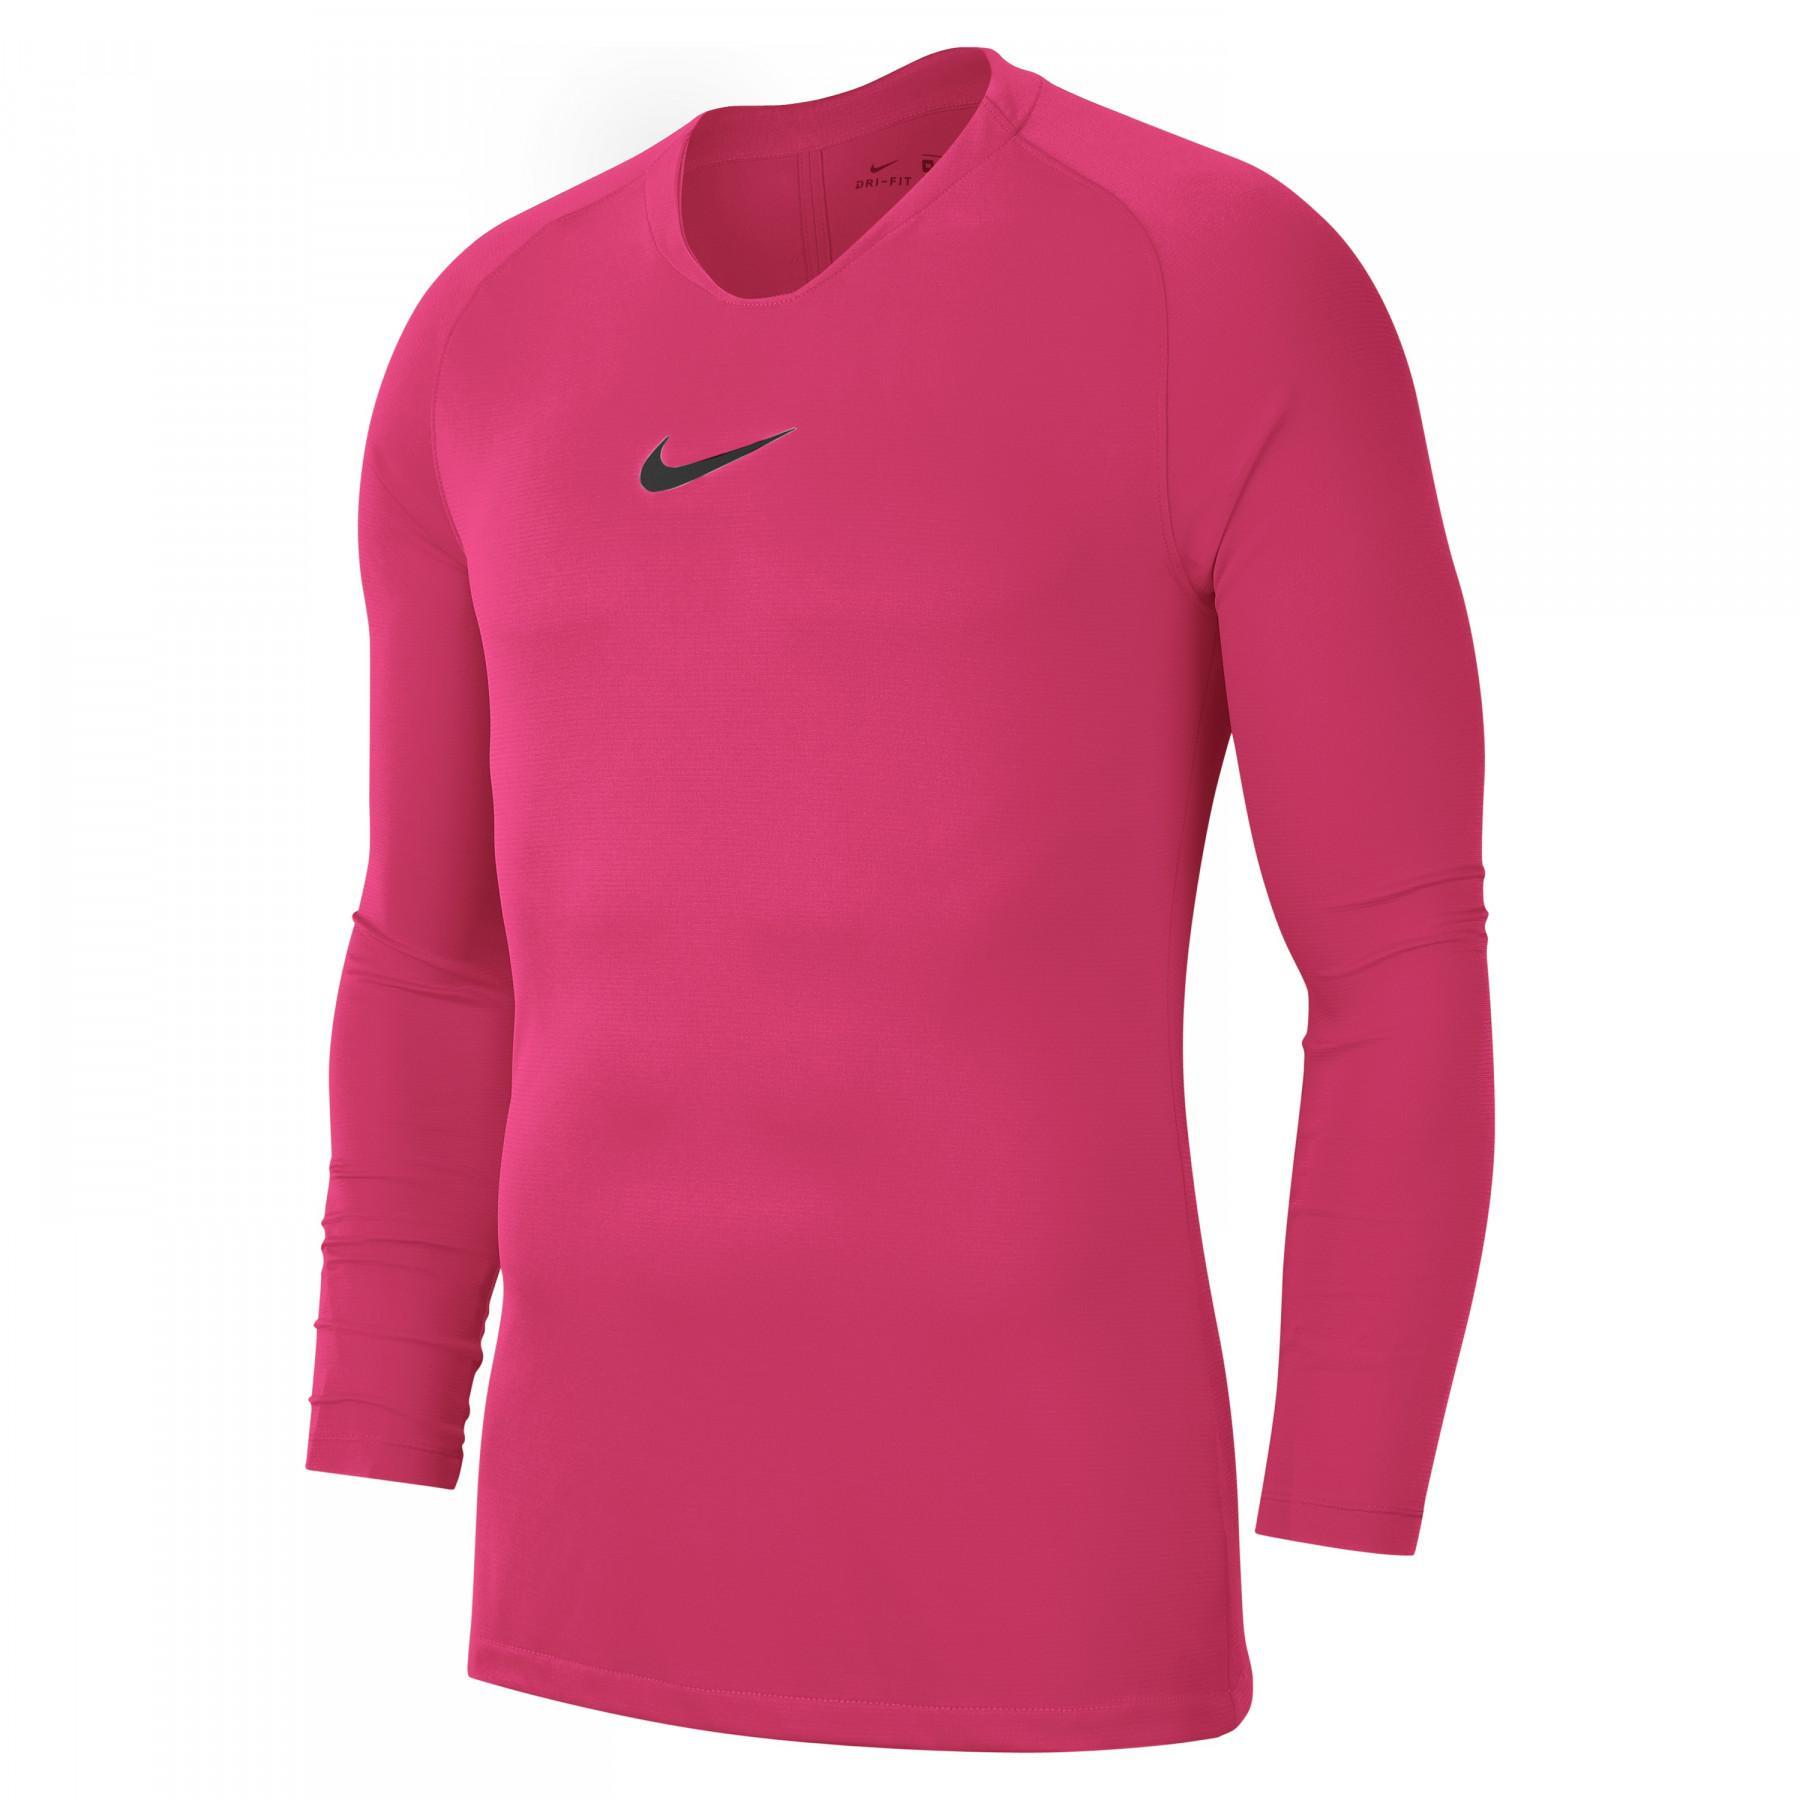 Compression jersey Nike Dri-FIT